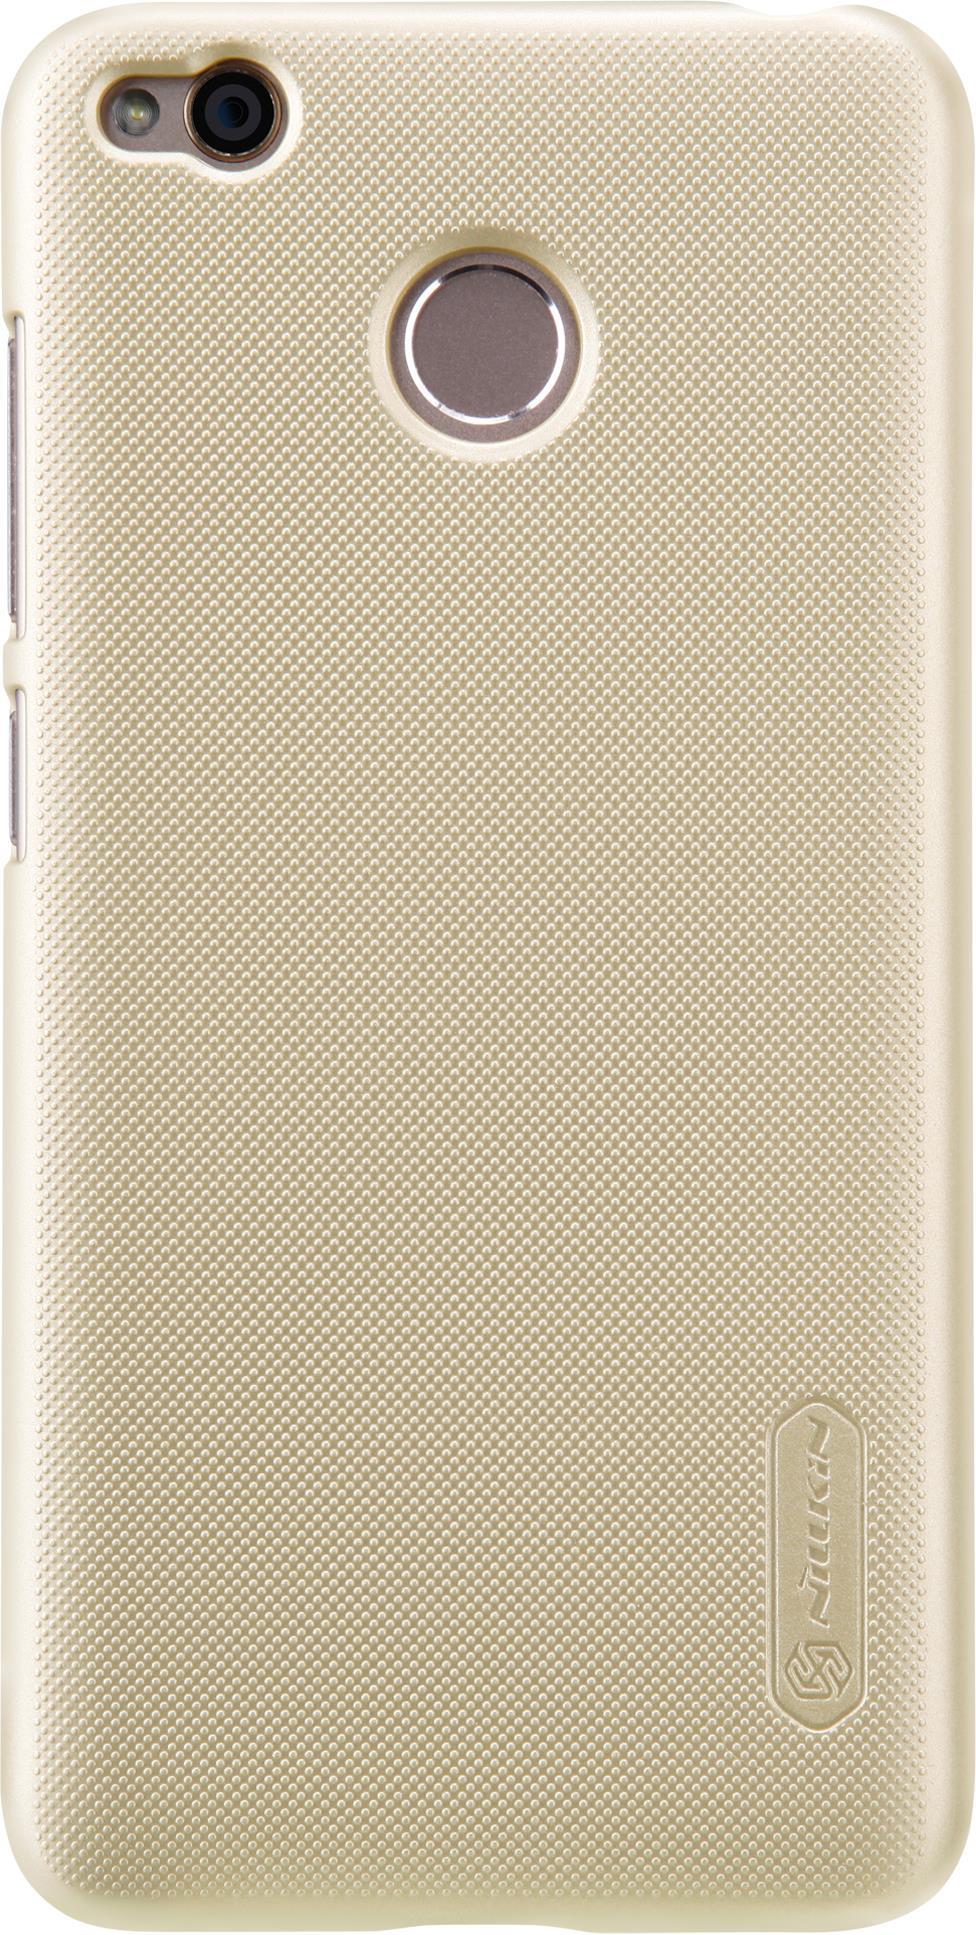 Накладка Nillkin Super Frosted для Xiaomi Redmi 4X, 6902048138940, золотистый